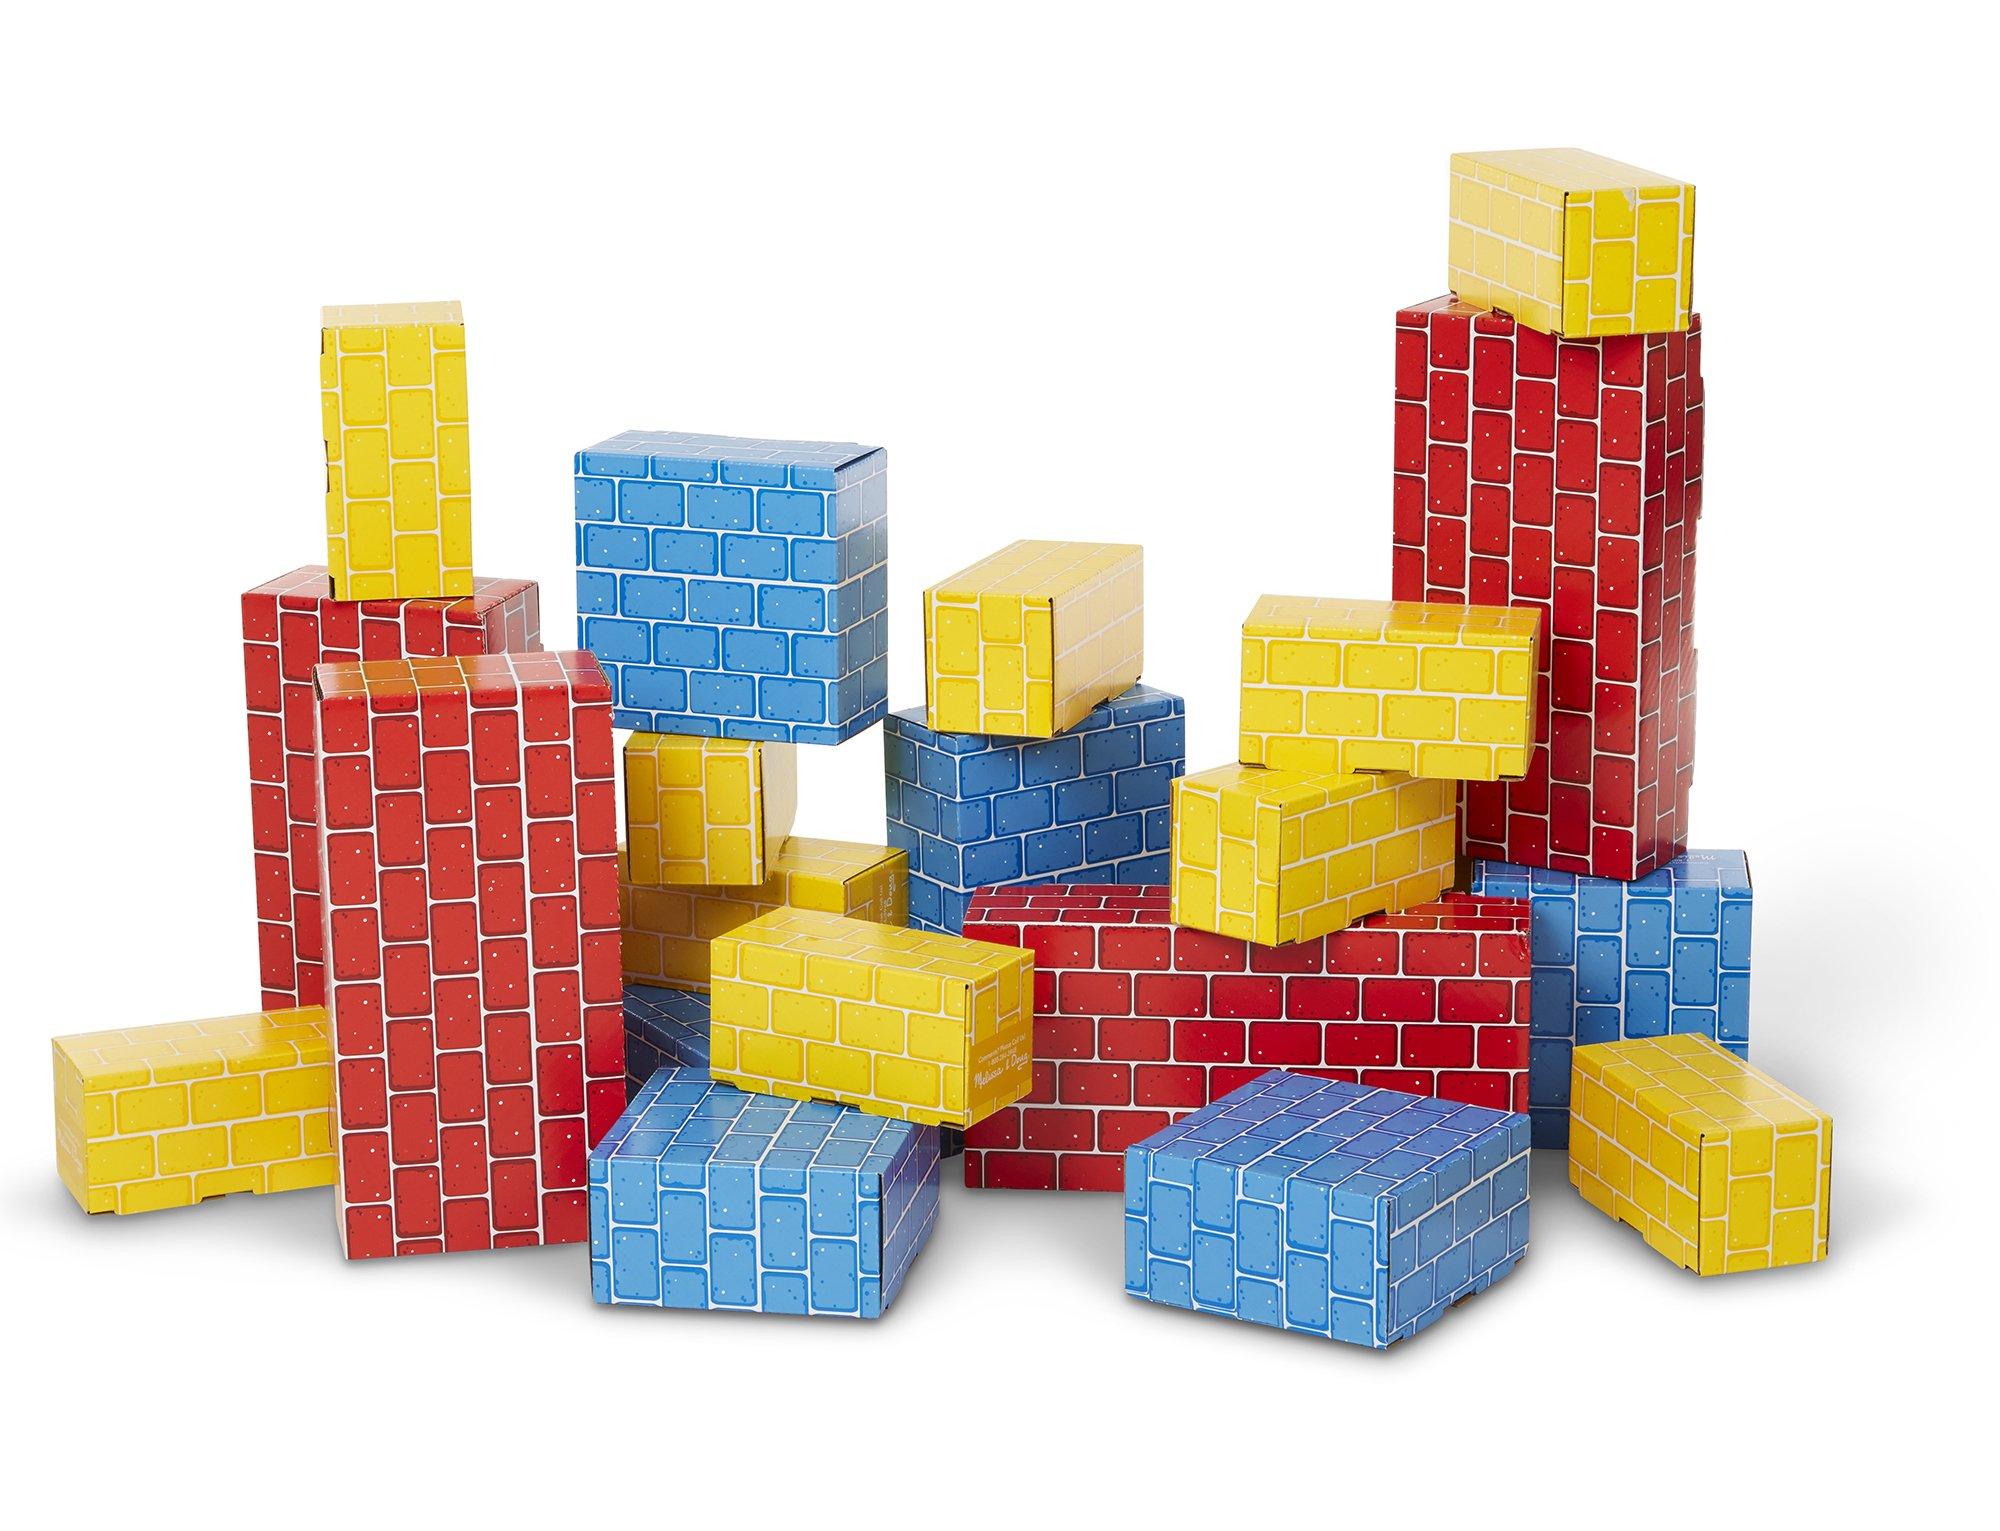 Melissa & Doug Extra-Thick Cardboard Building Blocks - 24 Blocks in 3 Sizes by Melissa & Doug (Image #3)